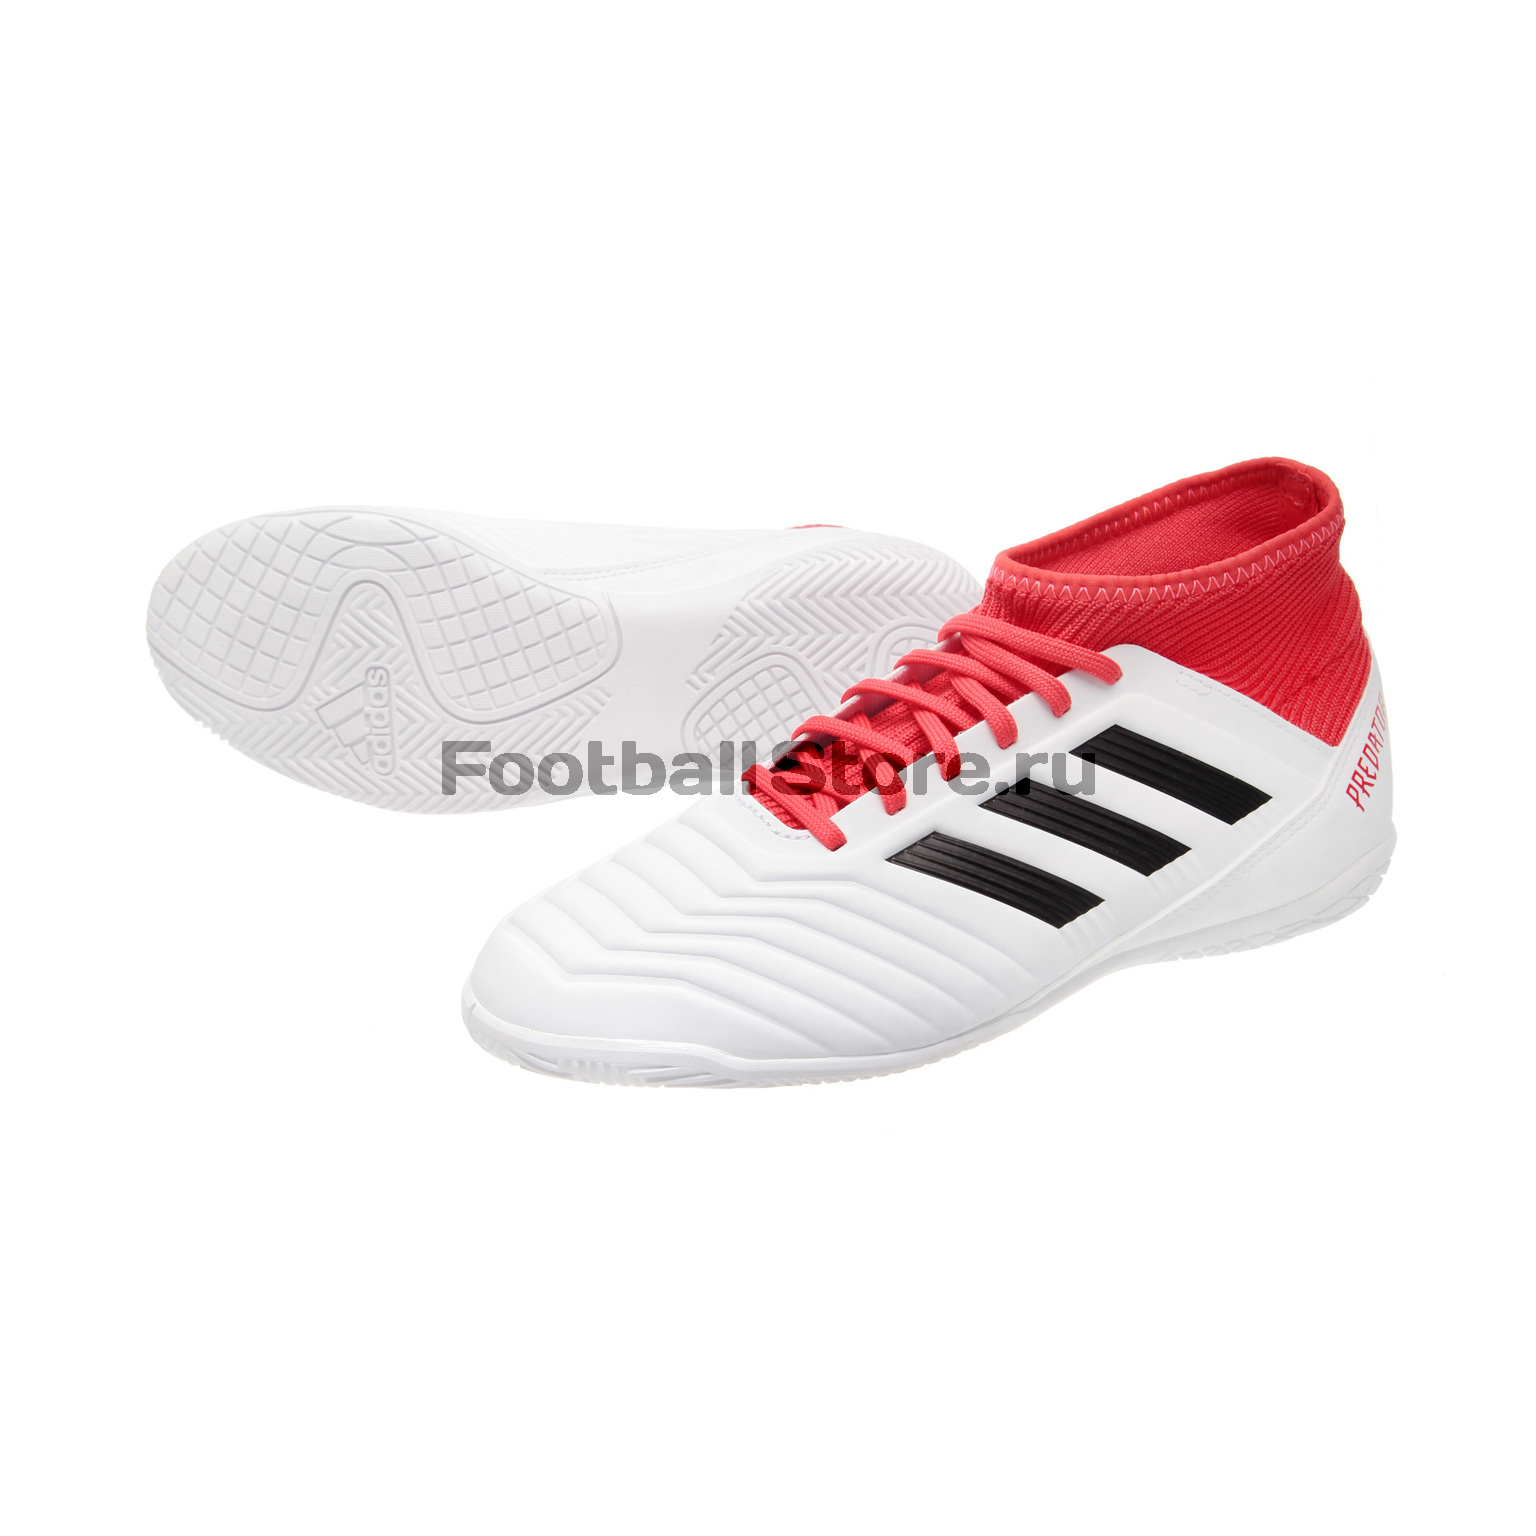 Обувь для зала Adidas Predator Tango 18.3 IN JR CP9073 обувь для зала adidas nemeziz tango 17 3 in jr cp9182